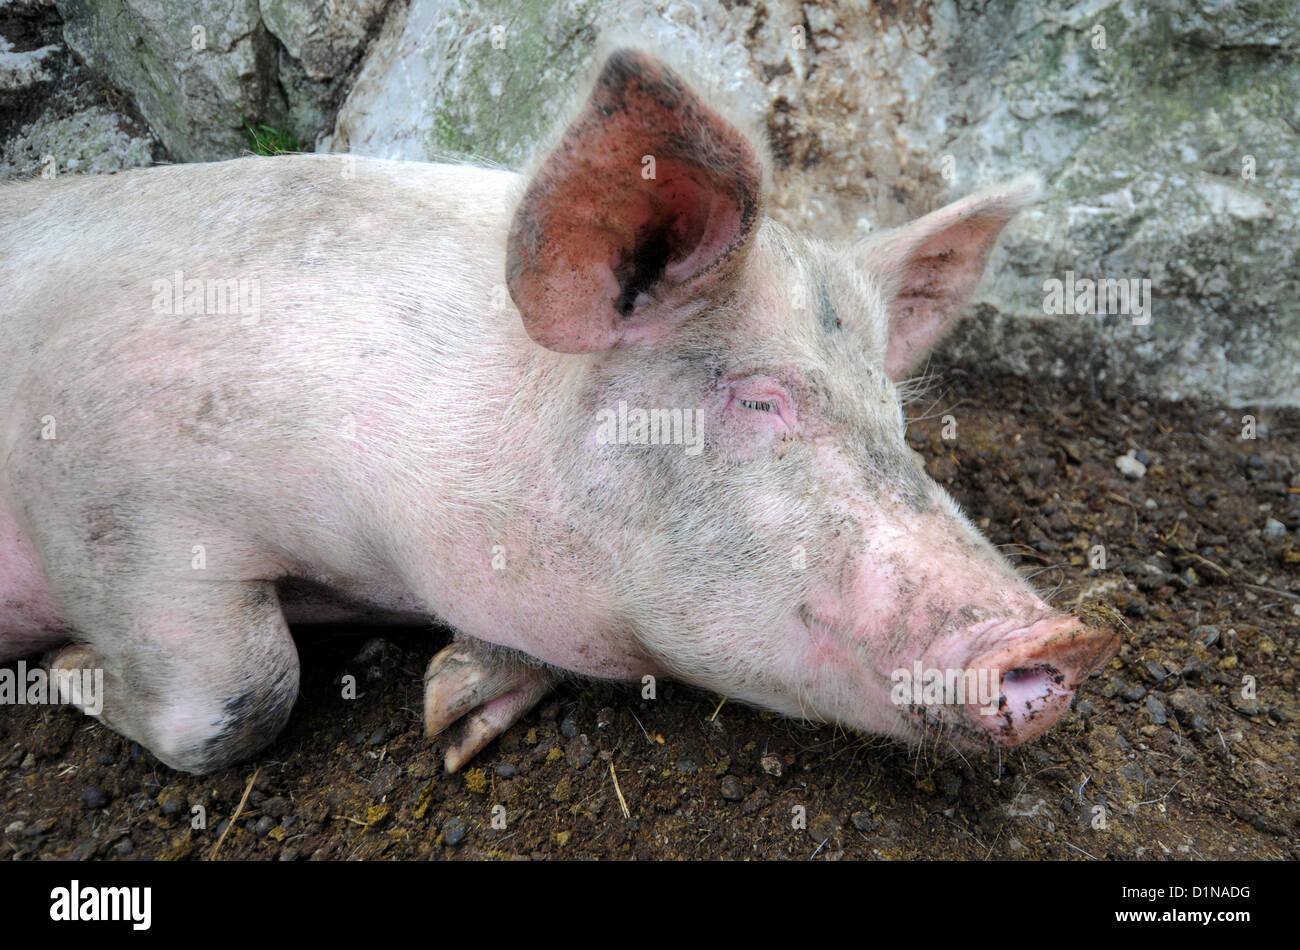 Schwein, Schwein, schlafen schlafen Schwein Stockbild